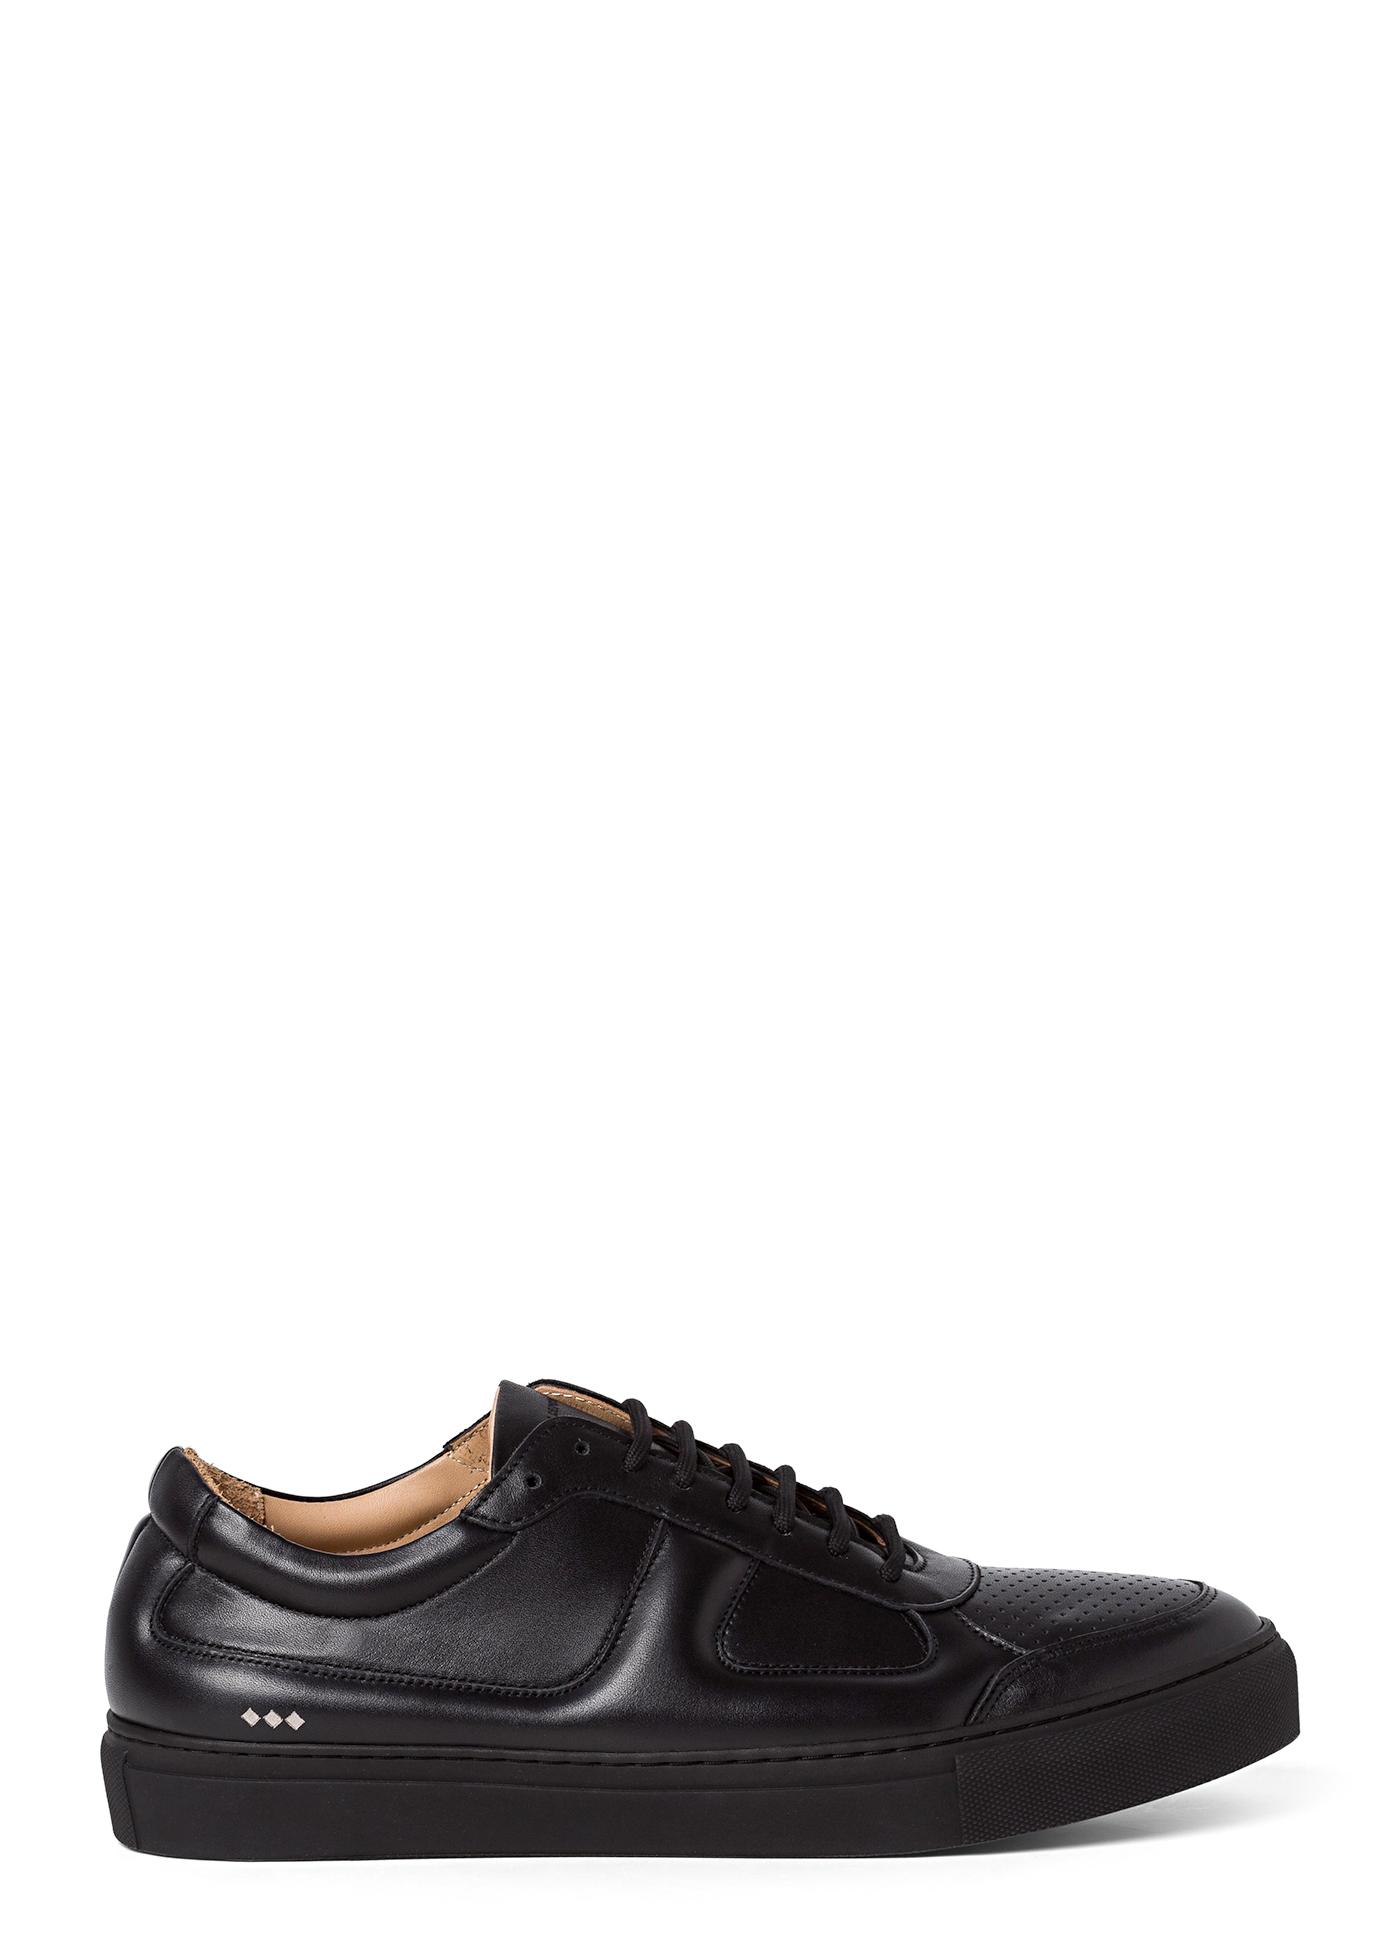 Spartacus Tennis Shoe 215 image number 0